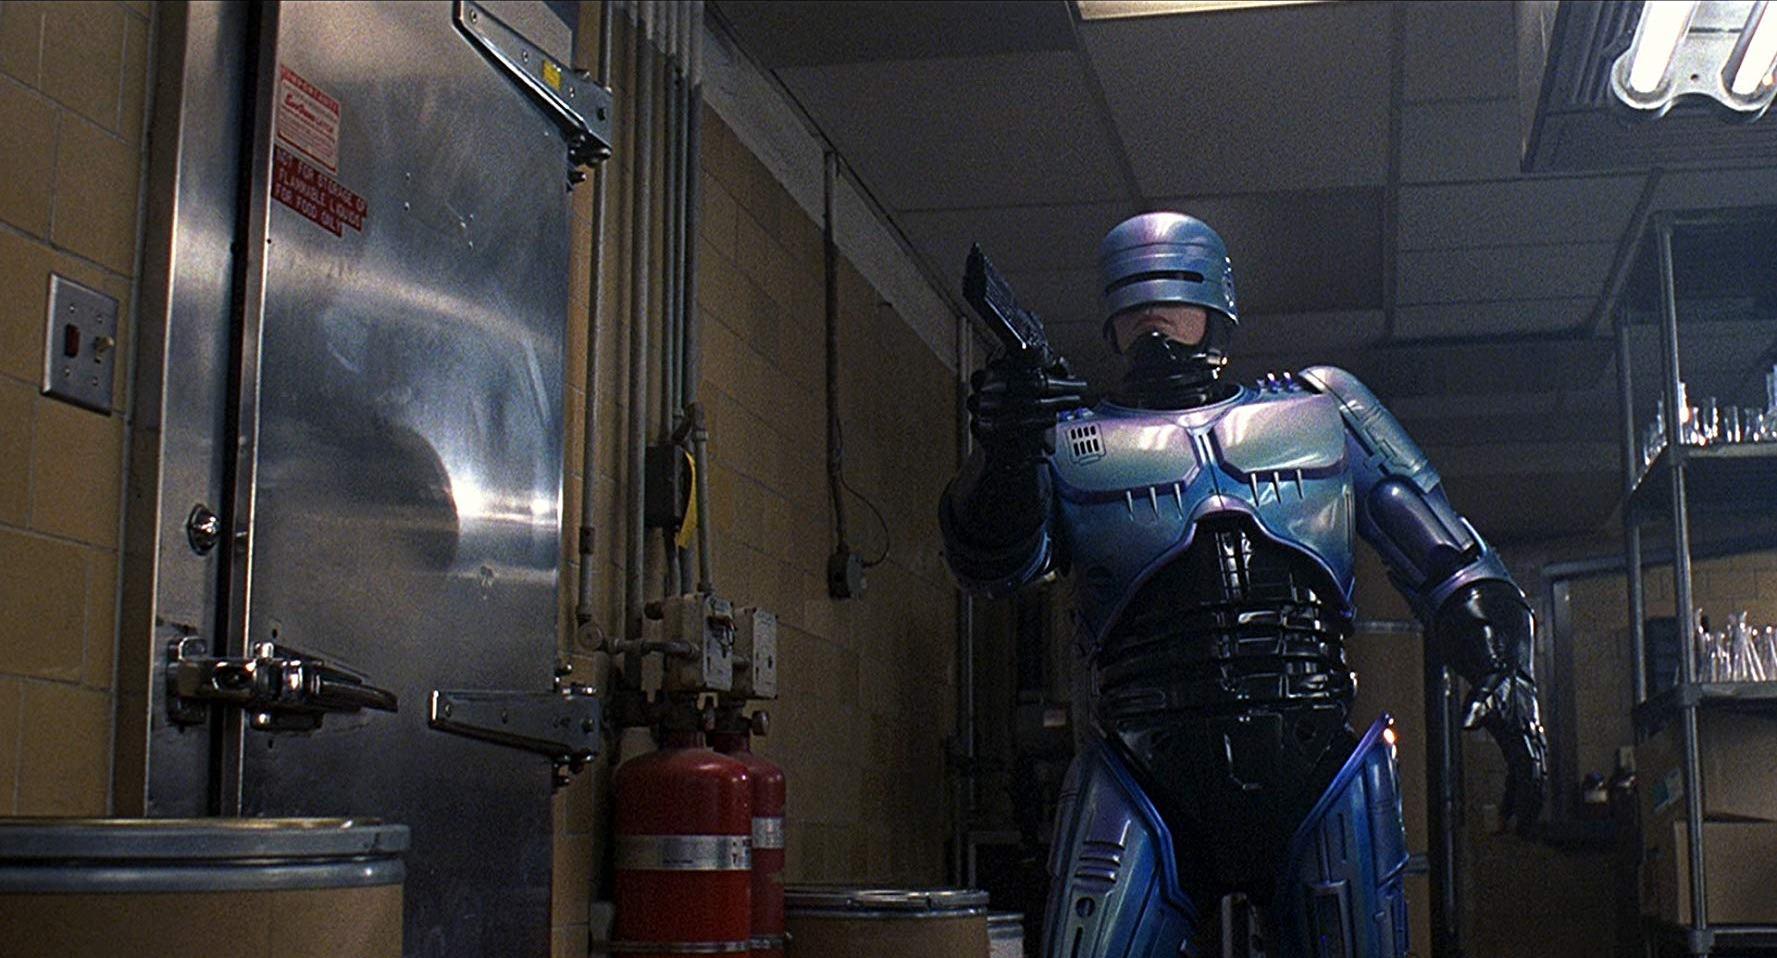 12a 1 20 Futuristic Facts About RoboCop 2